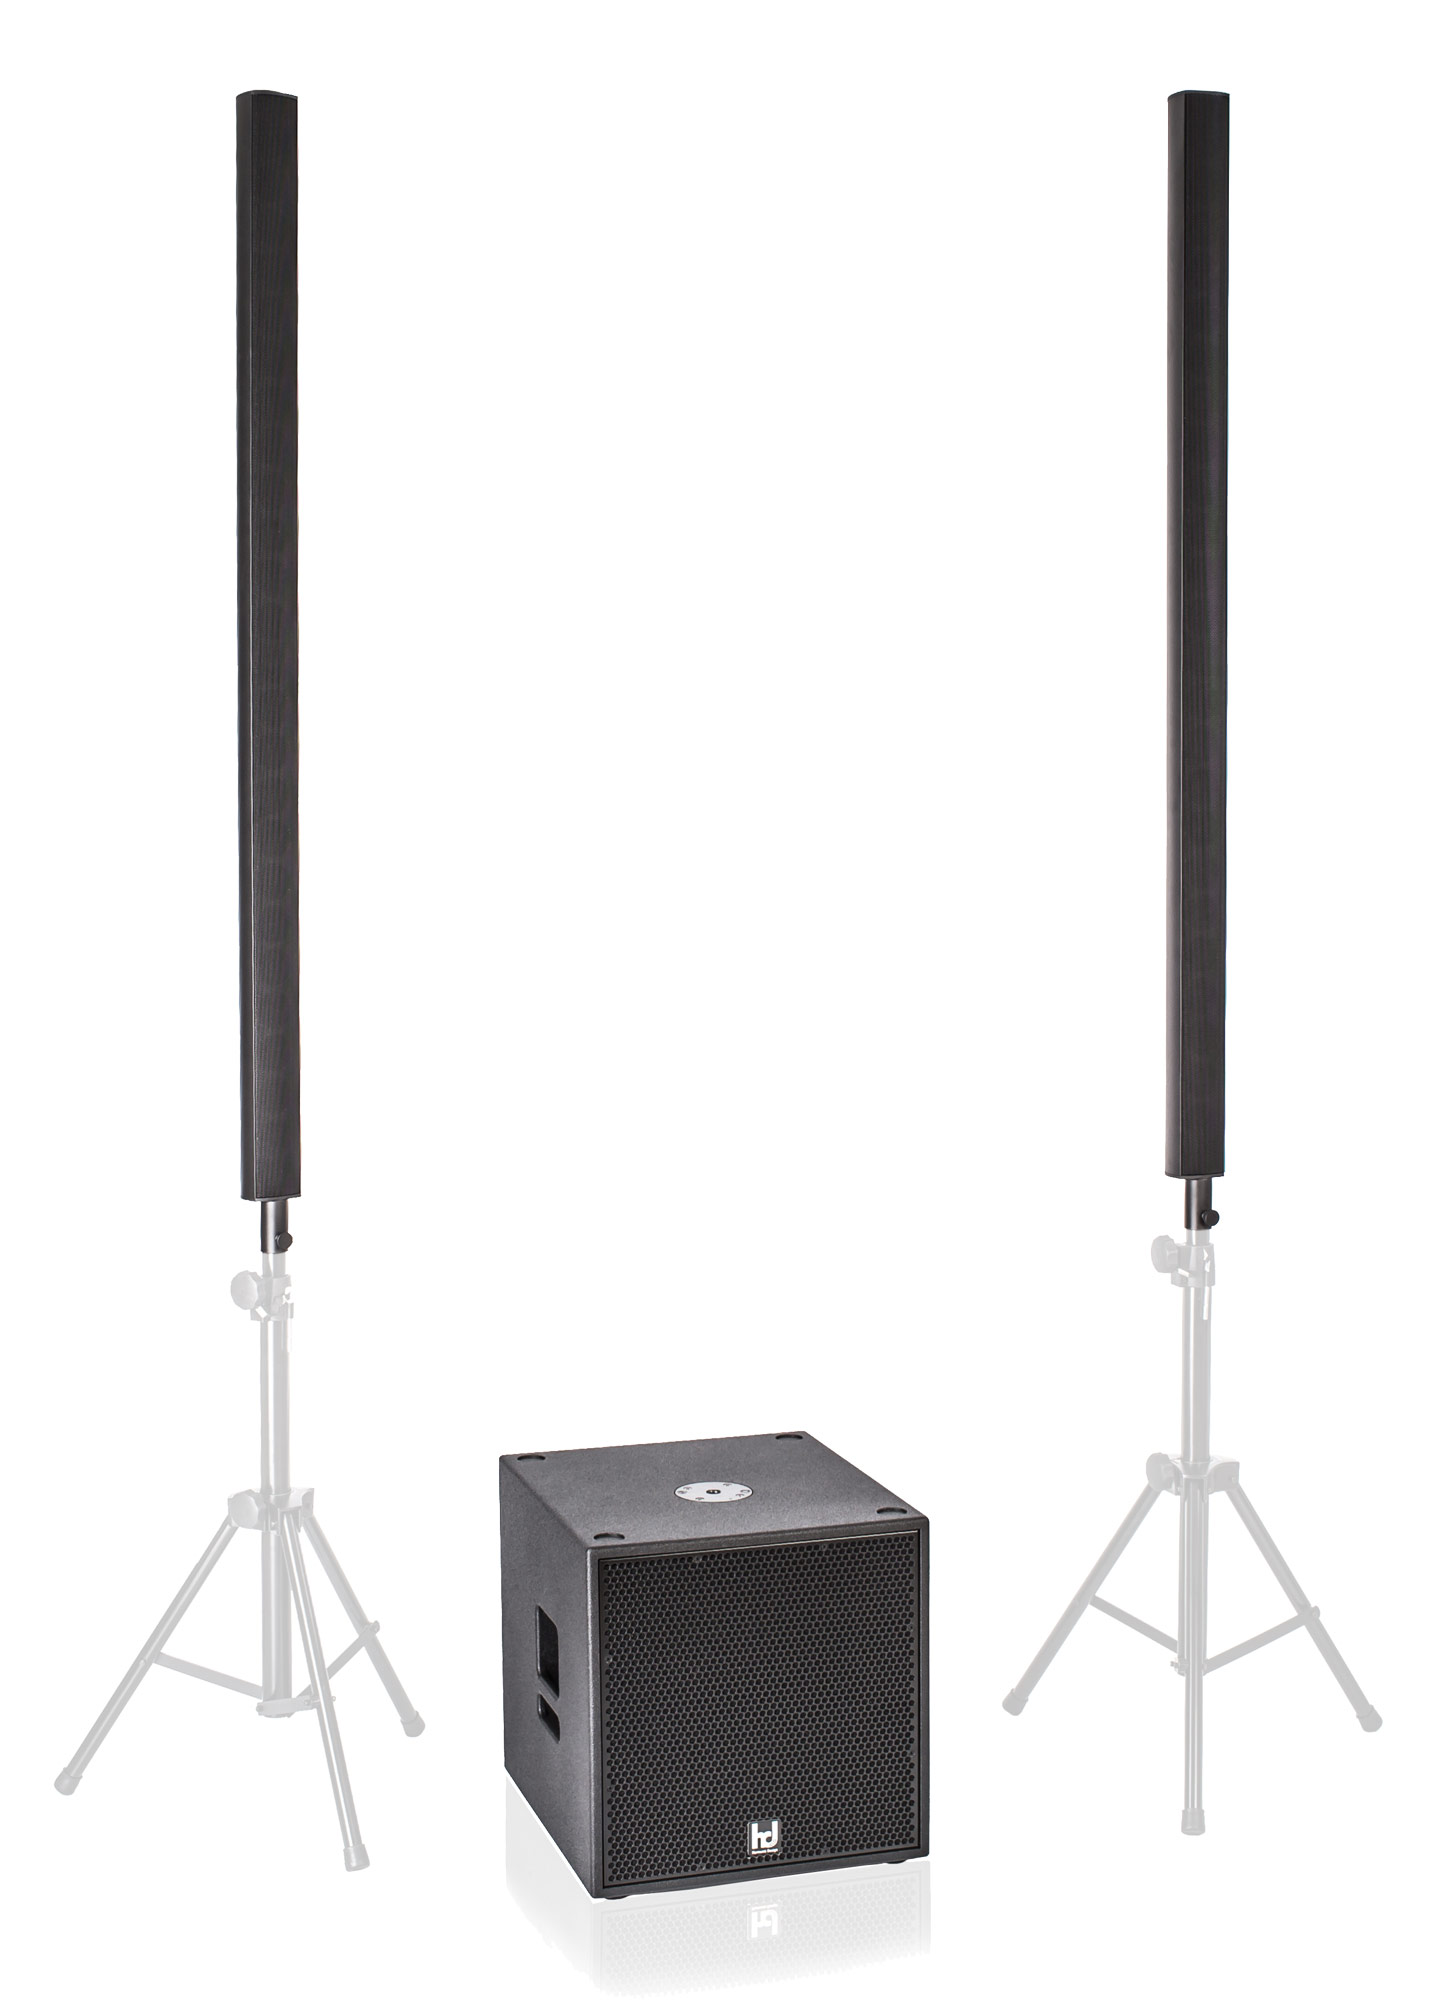 Harmonic Design ML16|P15 Multi DSP Aktivsystem 2200 W 2x ML16, 1x P15 Sub, Cover| Taschen Retoure (Zustand sehr gut)